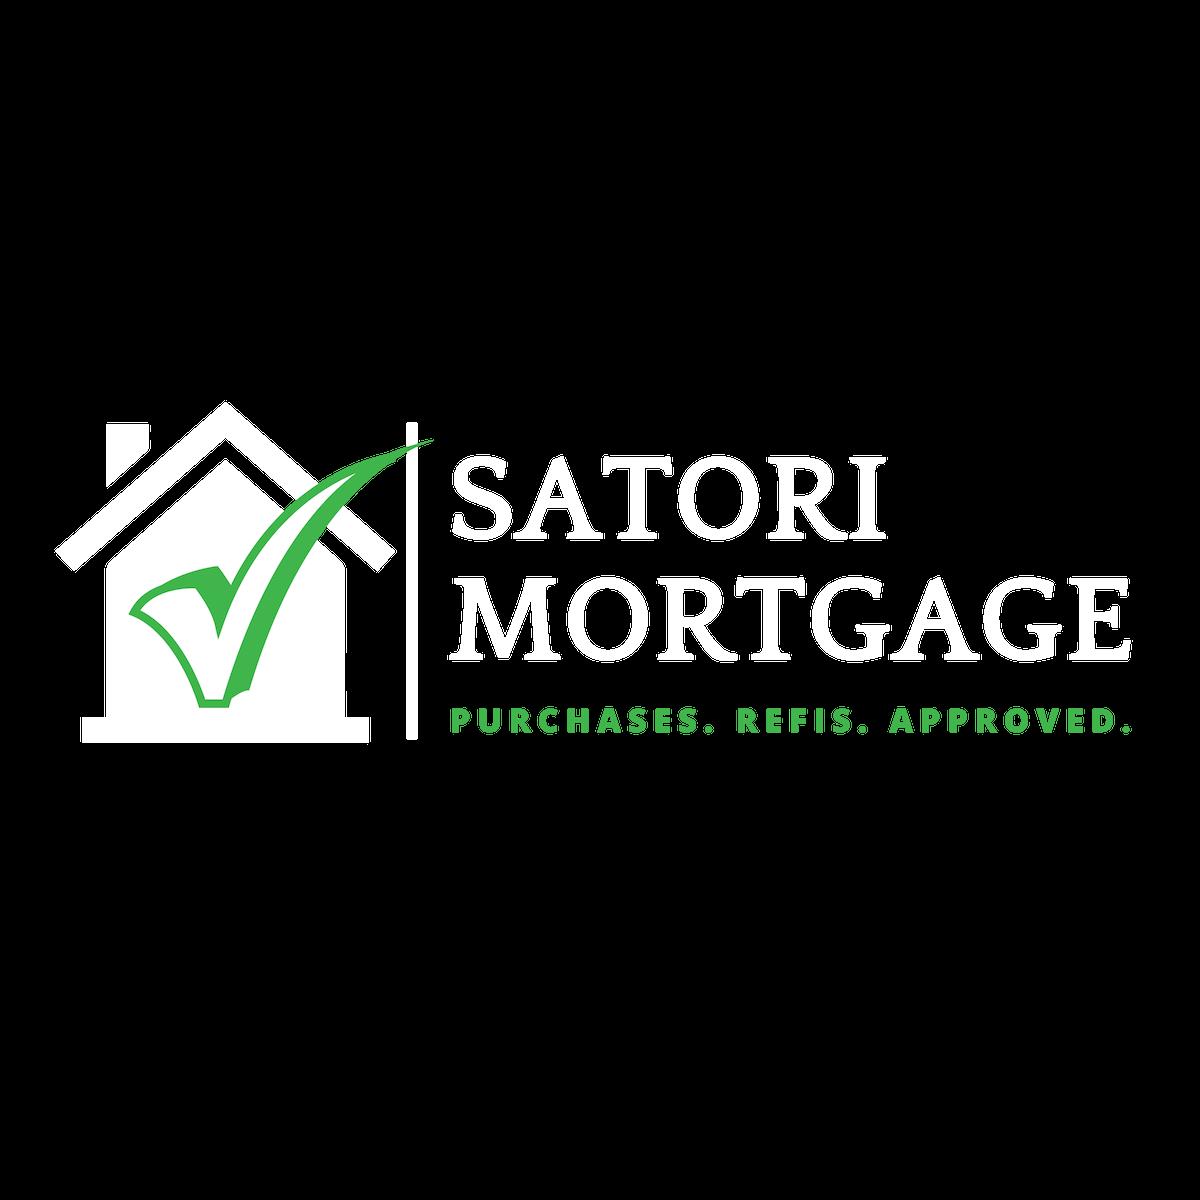 New Satori Mortgage Logo Transparent